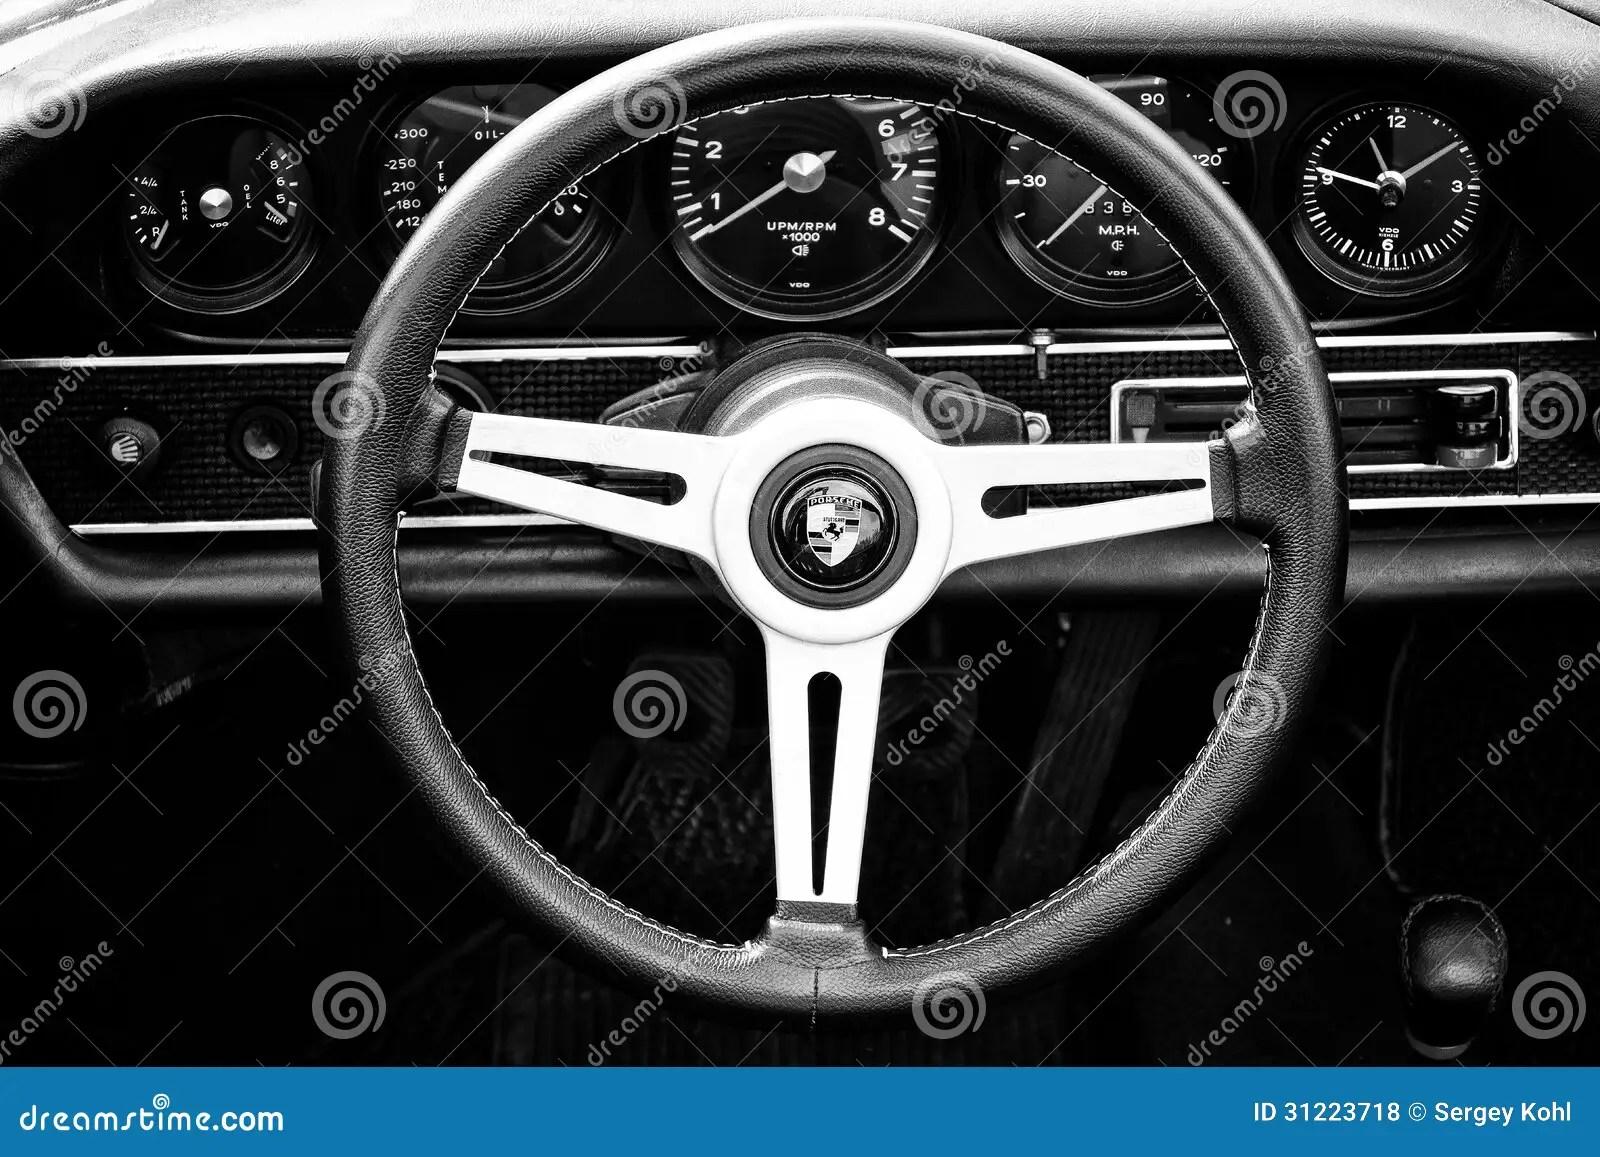 3d Animation Wallpaper Download Cab Porsche 911 Targa Black And White Editorial Stock